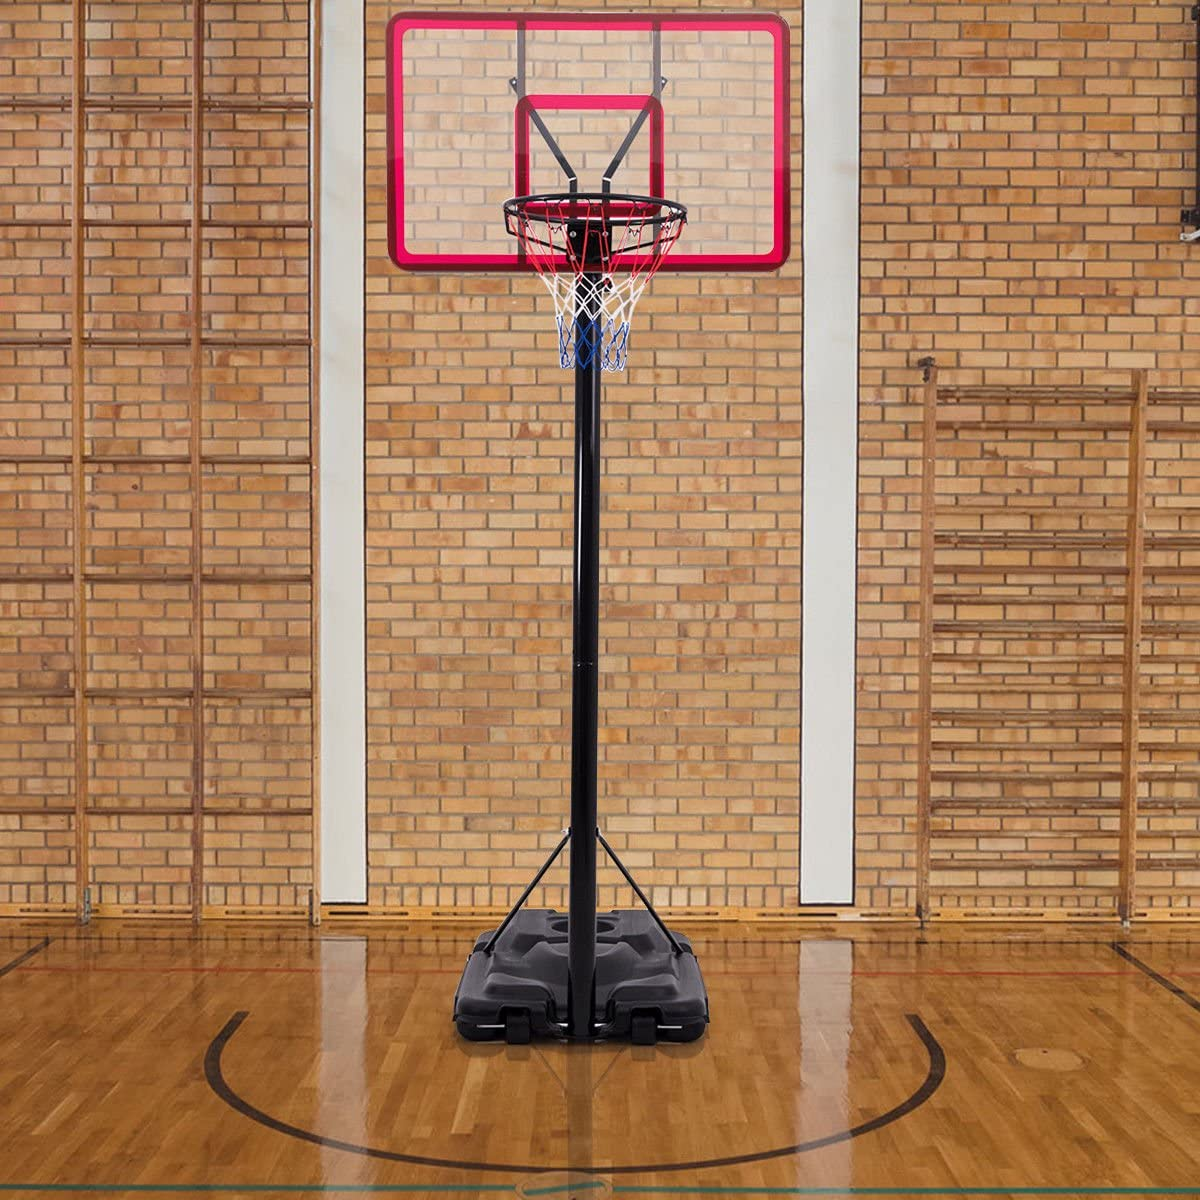 KCHEX>>>10フィート 高さ調節可能 バスケットボール システム フープ スタンド バックボード アウトドア ホイール付き>当社のバスケットボール スタンドは真のバスケットボール体験を提供します。 頑丈なベース、バックボード、構造。